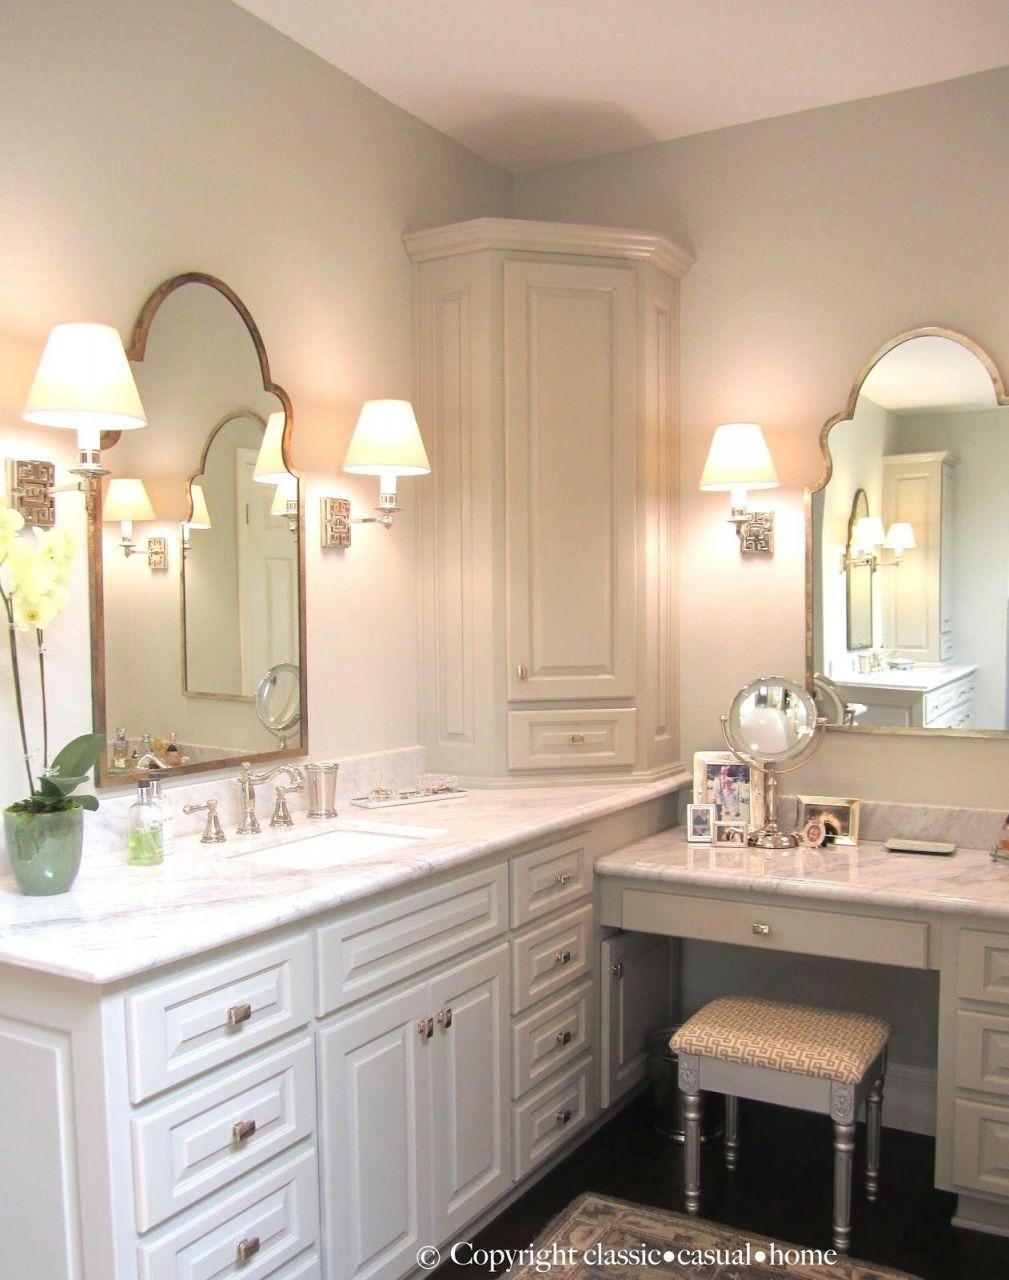 Pin By Alma Andrea Rodriguez On Renovation Bathroom With Makeup Vanity Corner Bathroom Vanity Amazing Bathrooms